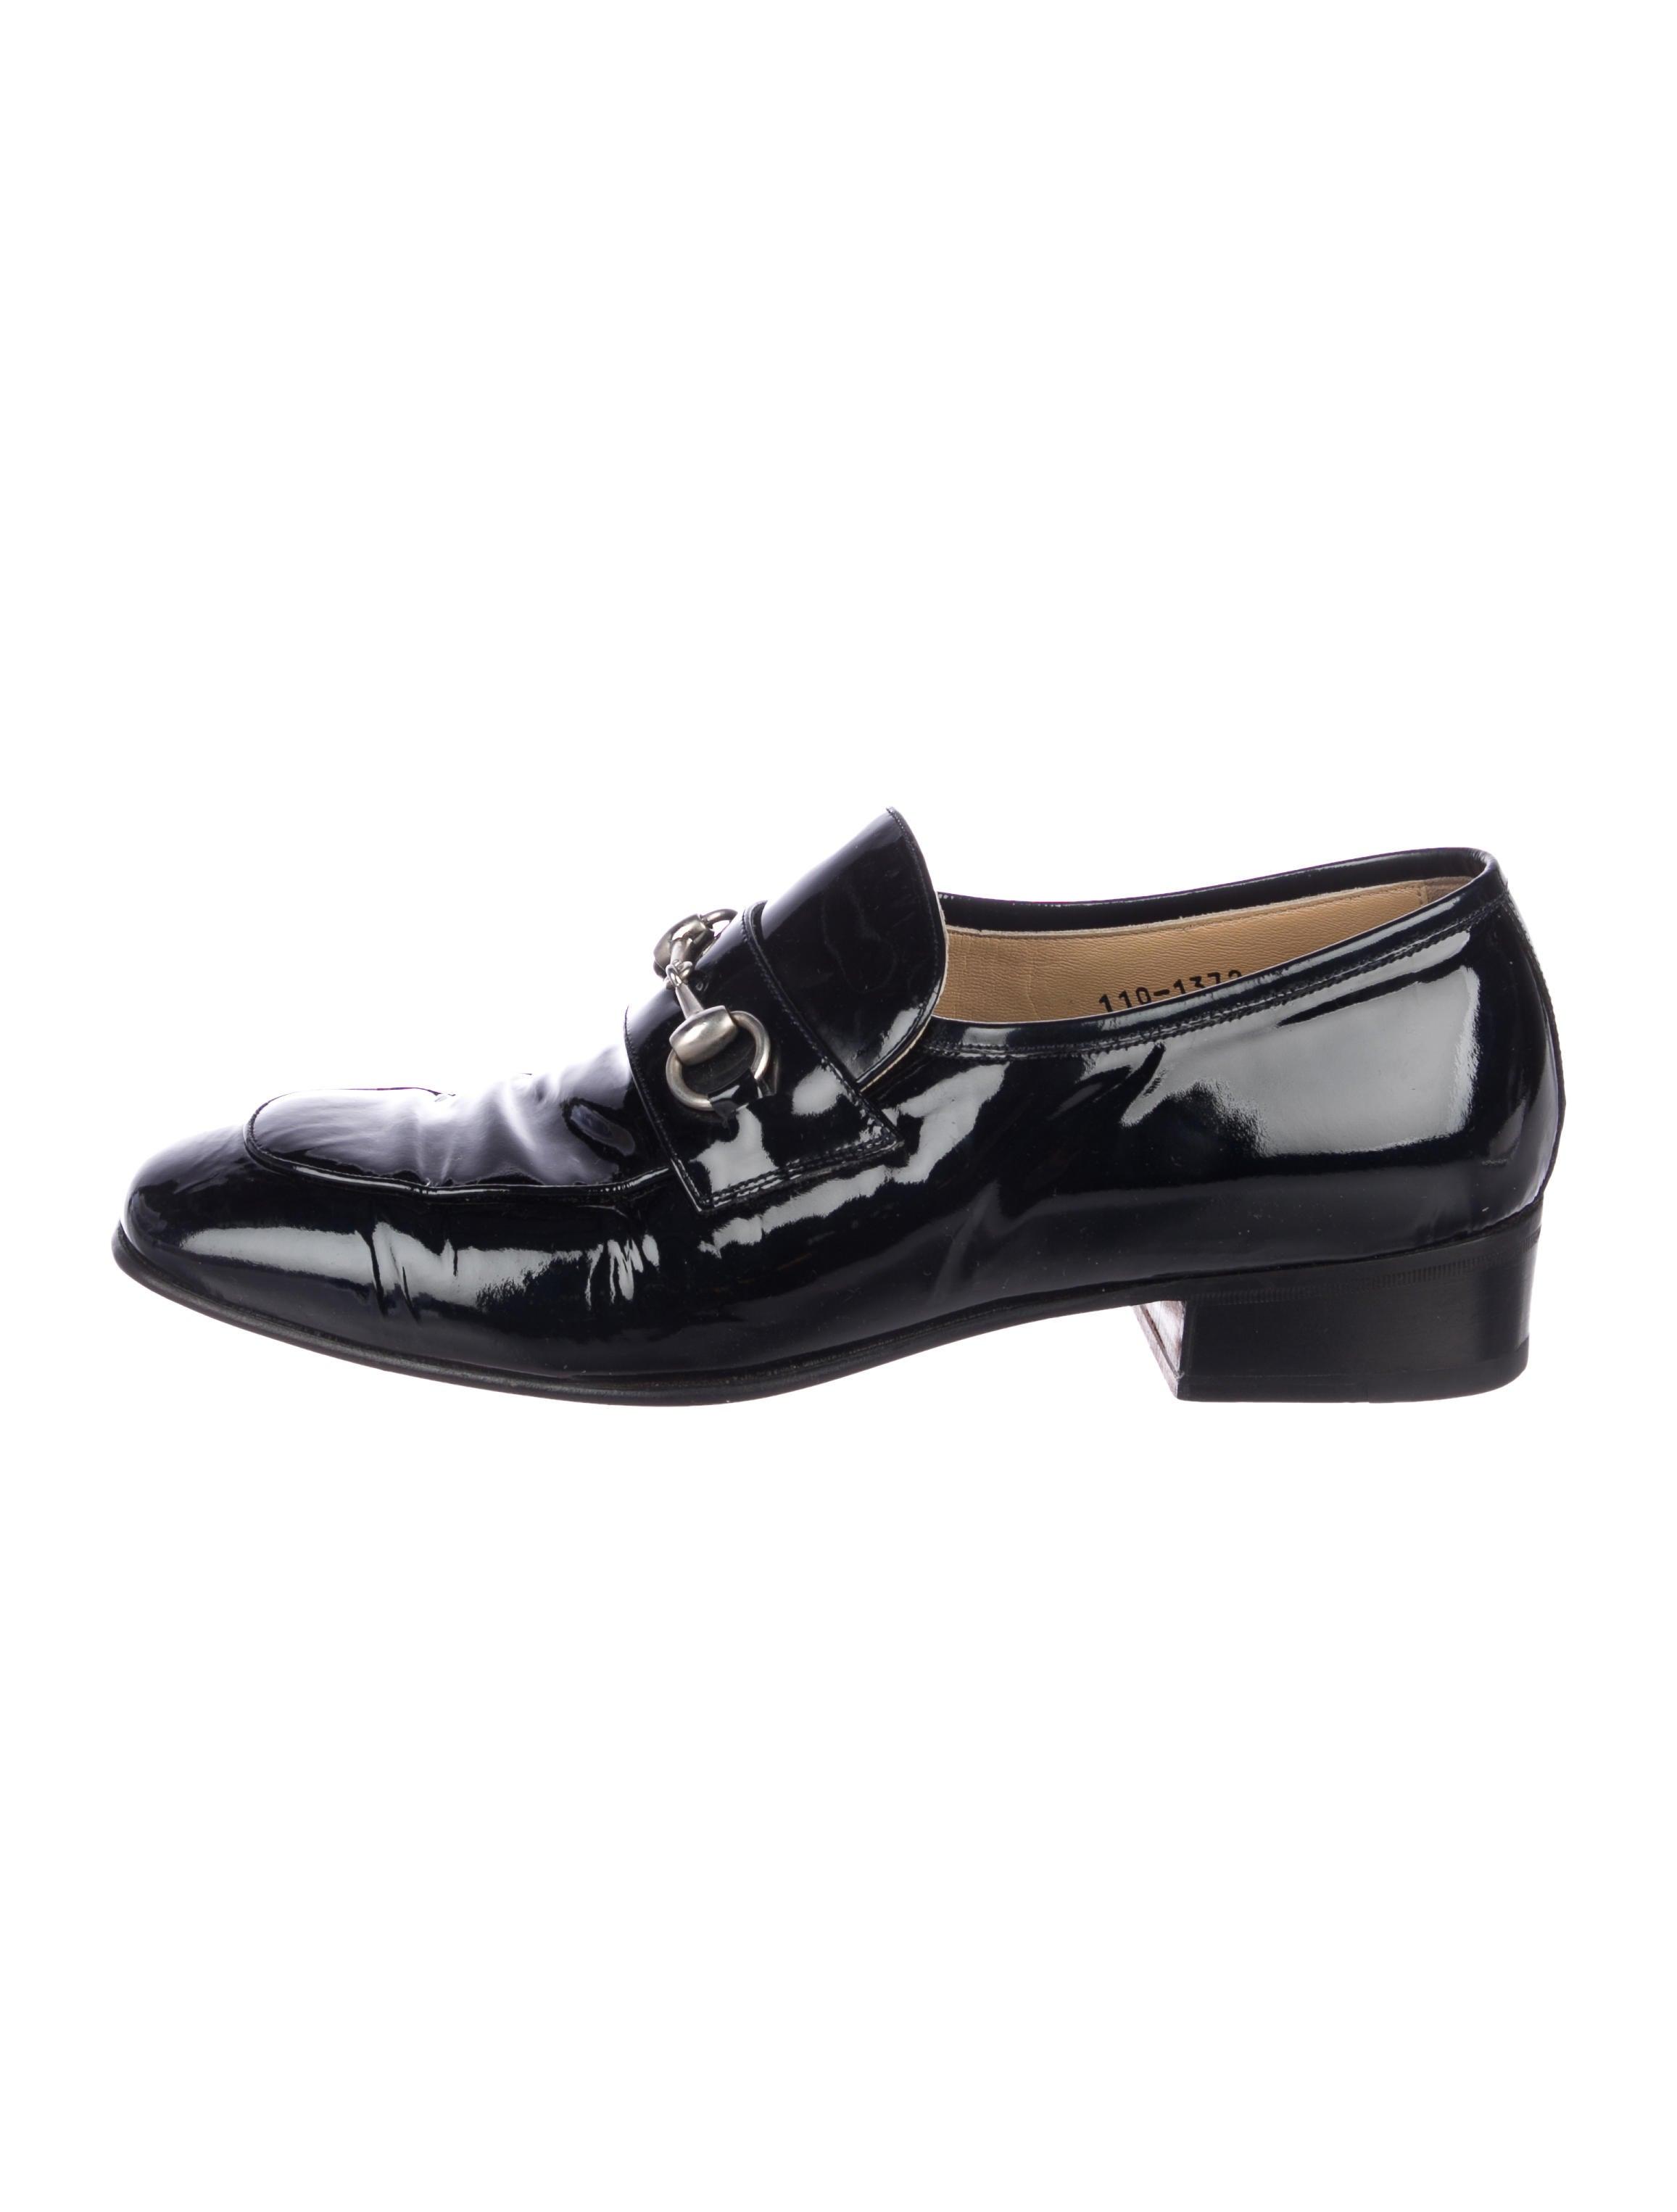 b3f8f71f37e Gucci Horsebit Patent Leather Loafers - Shoes - GUC250632